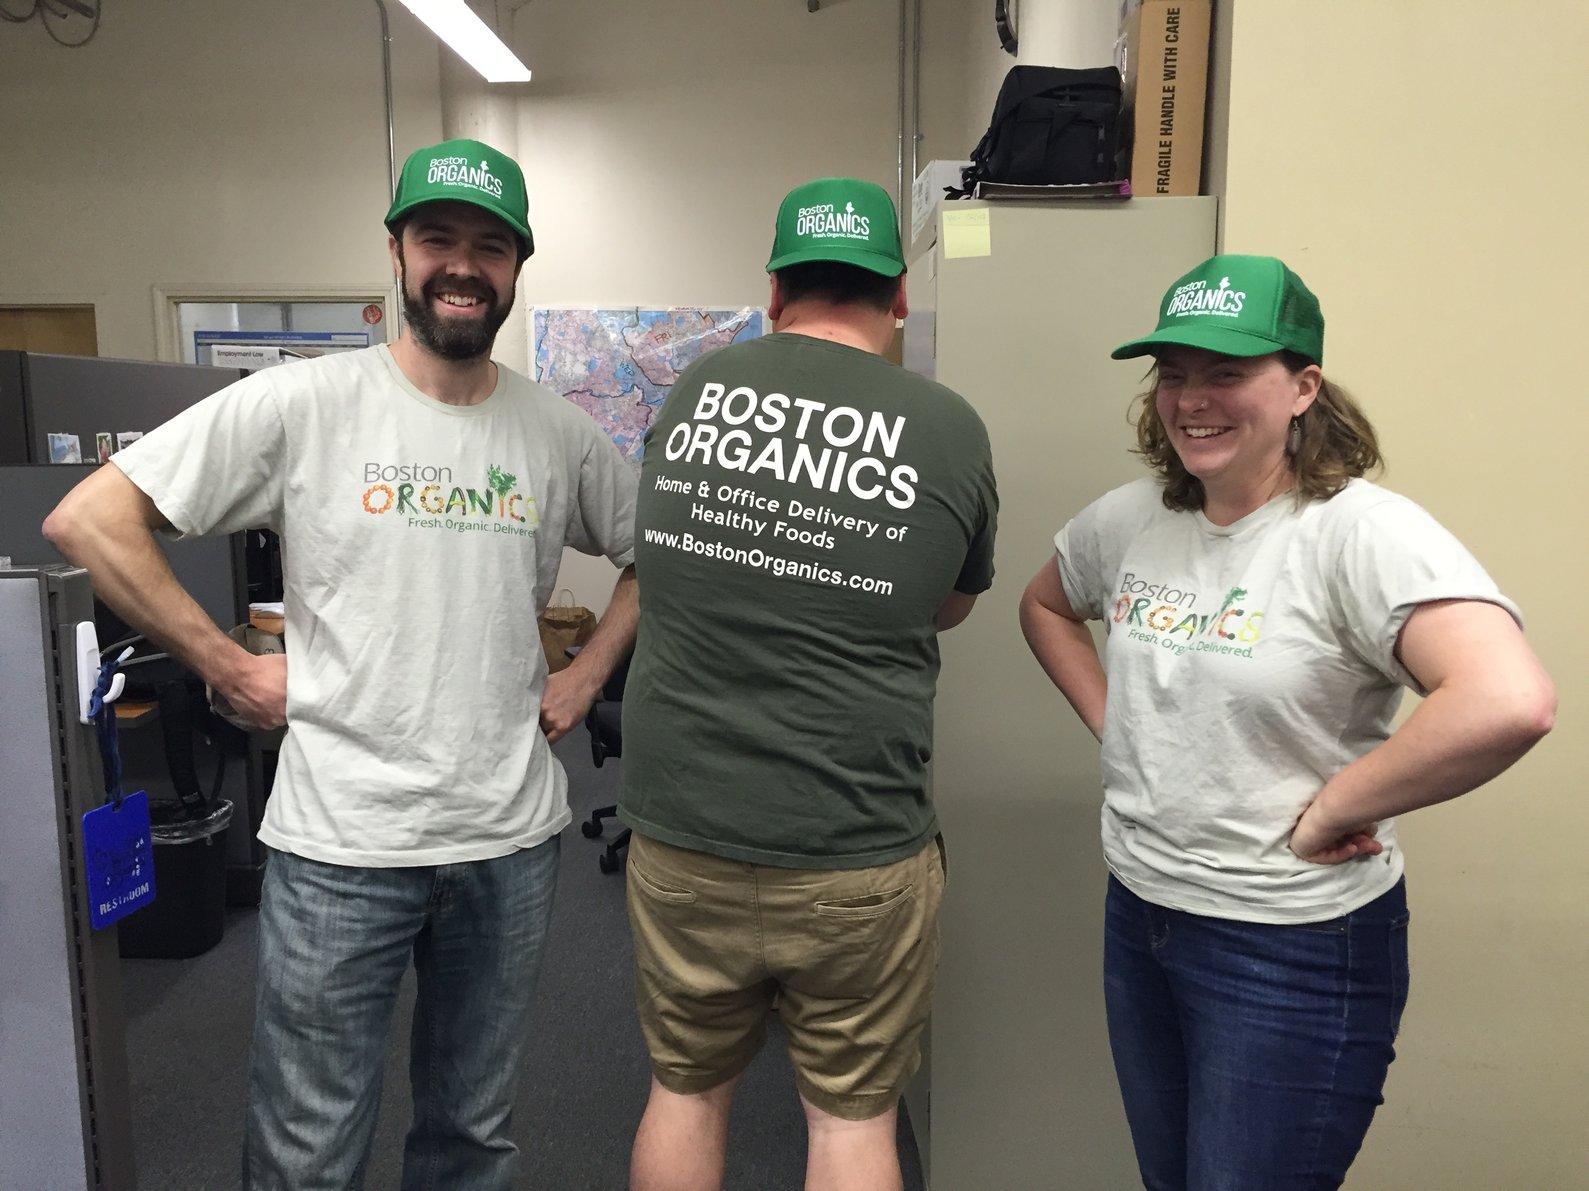 Team Boston Organics